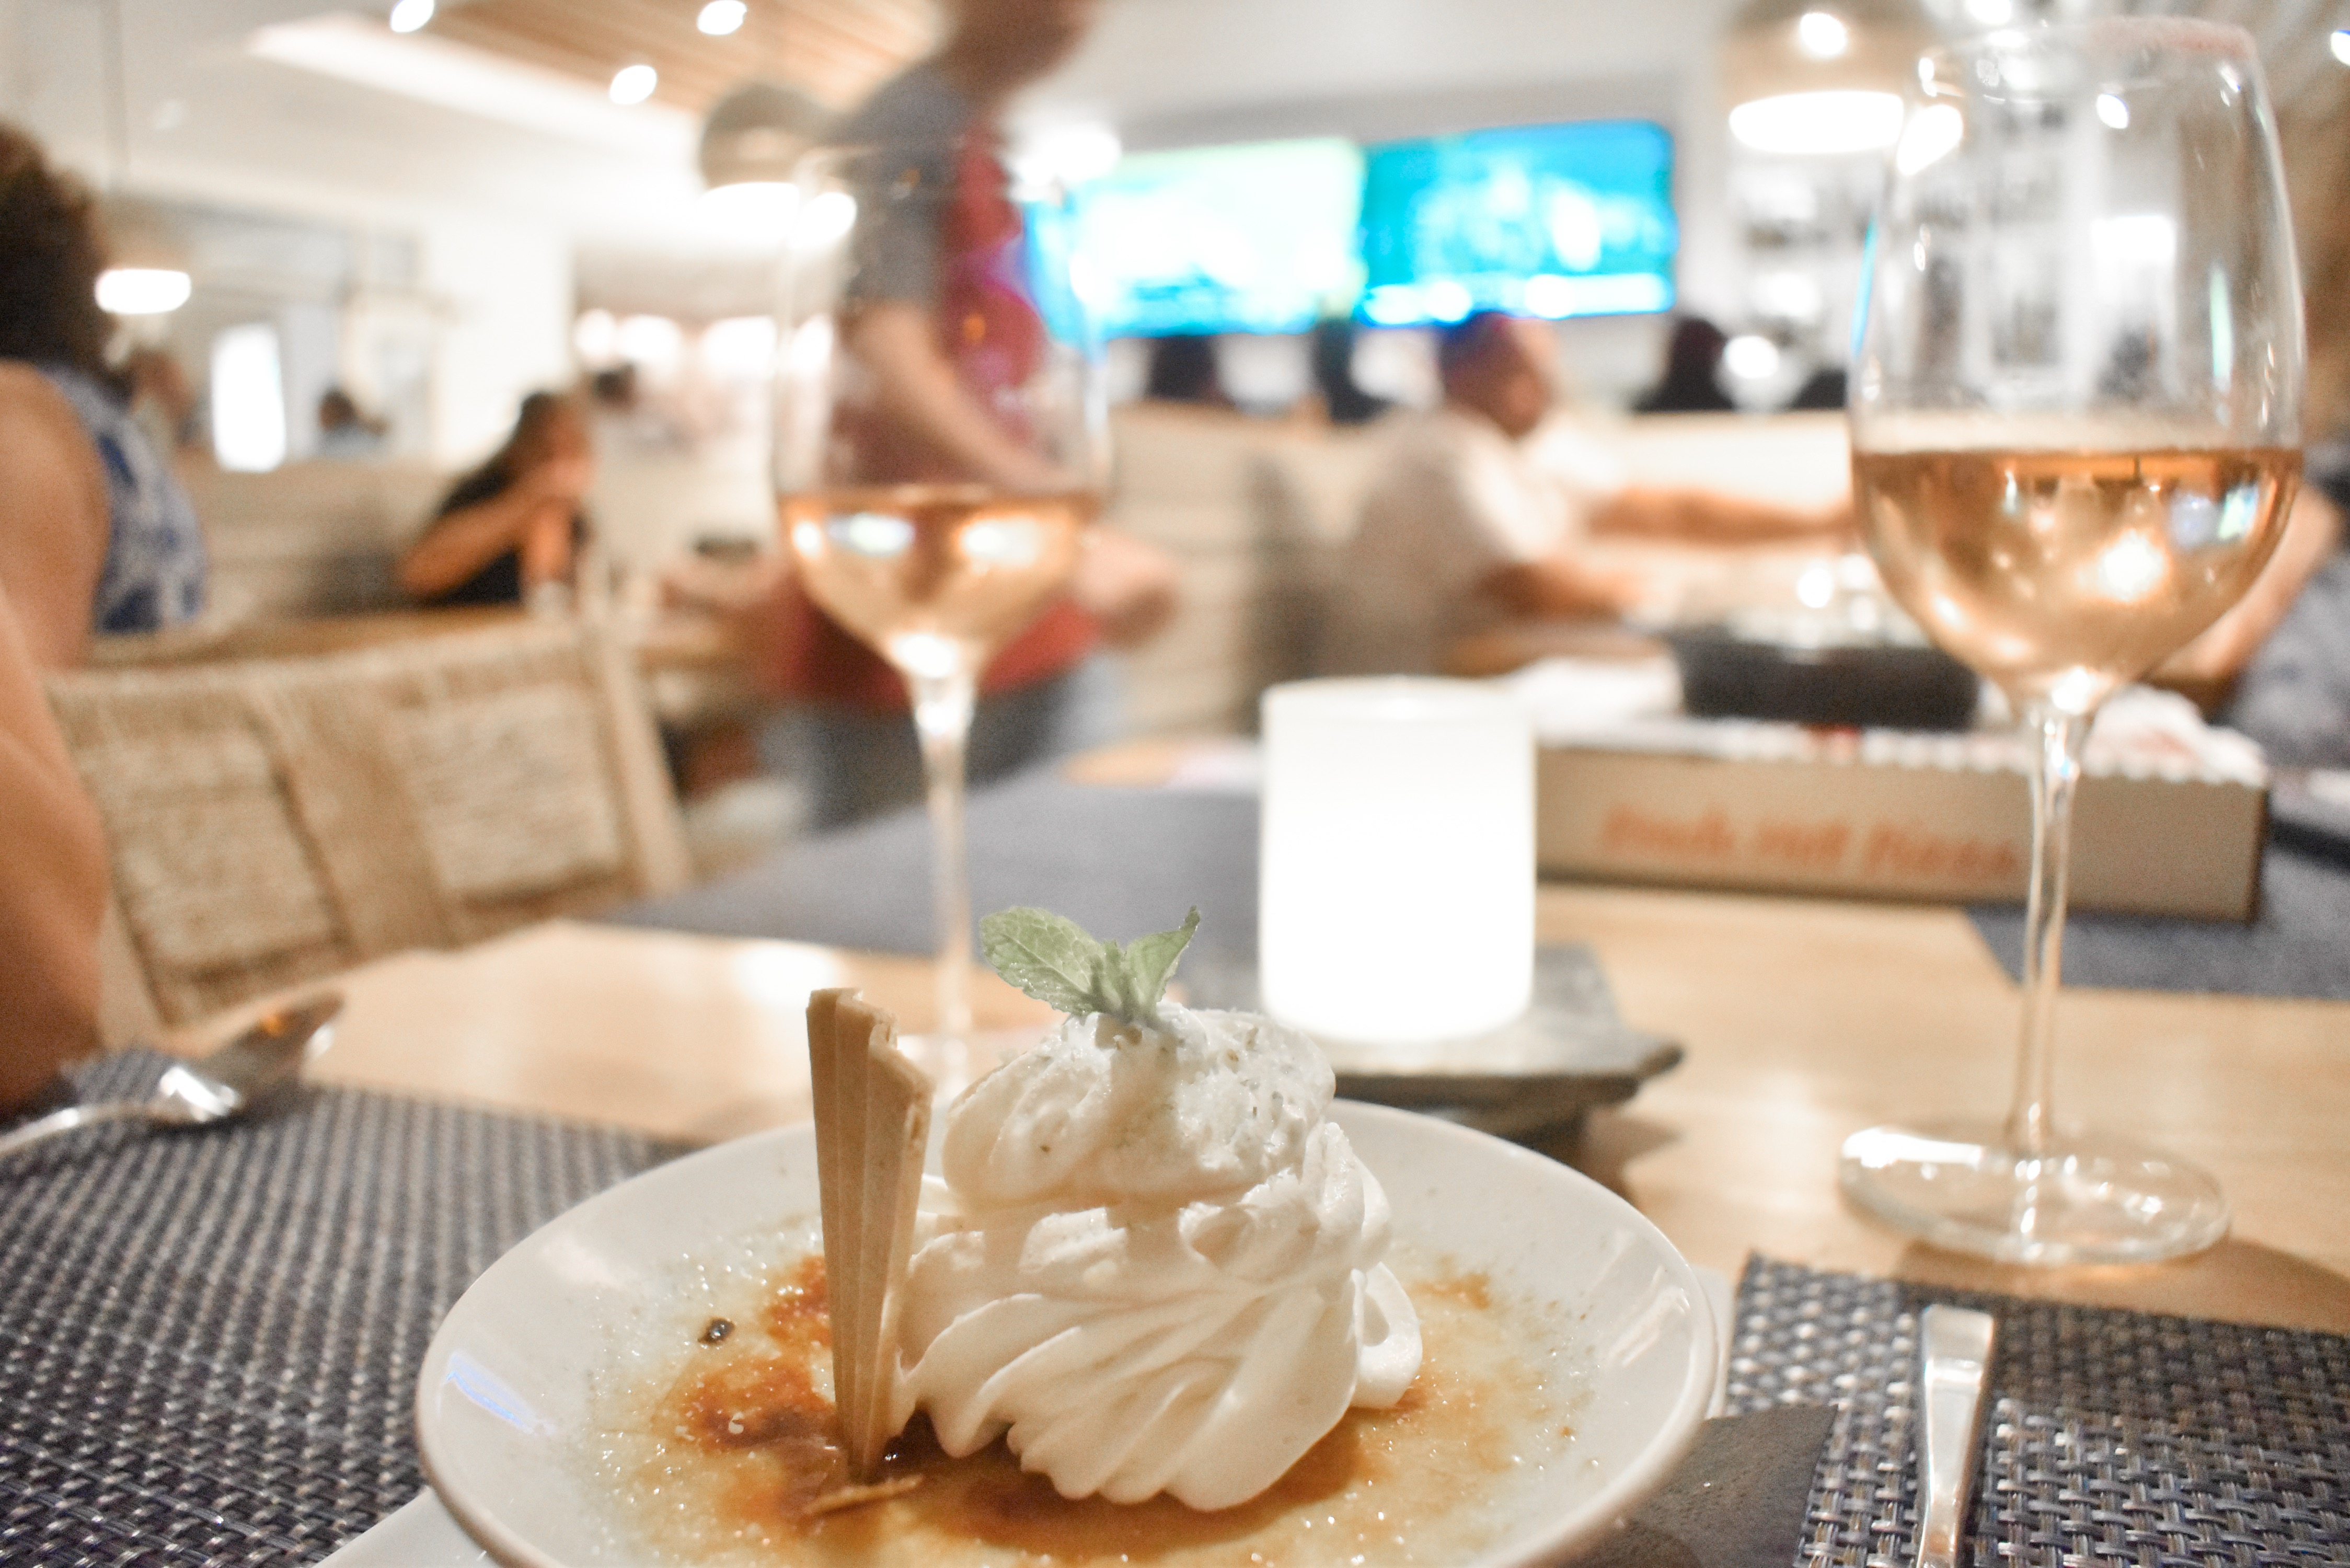 Hutchinson Shores - 30A Mama Travel - Dessert at Drift